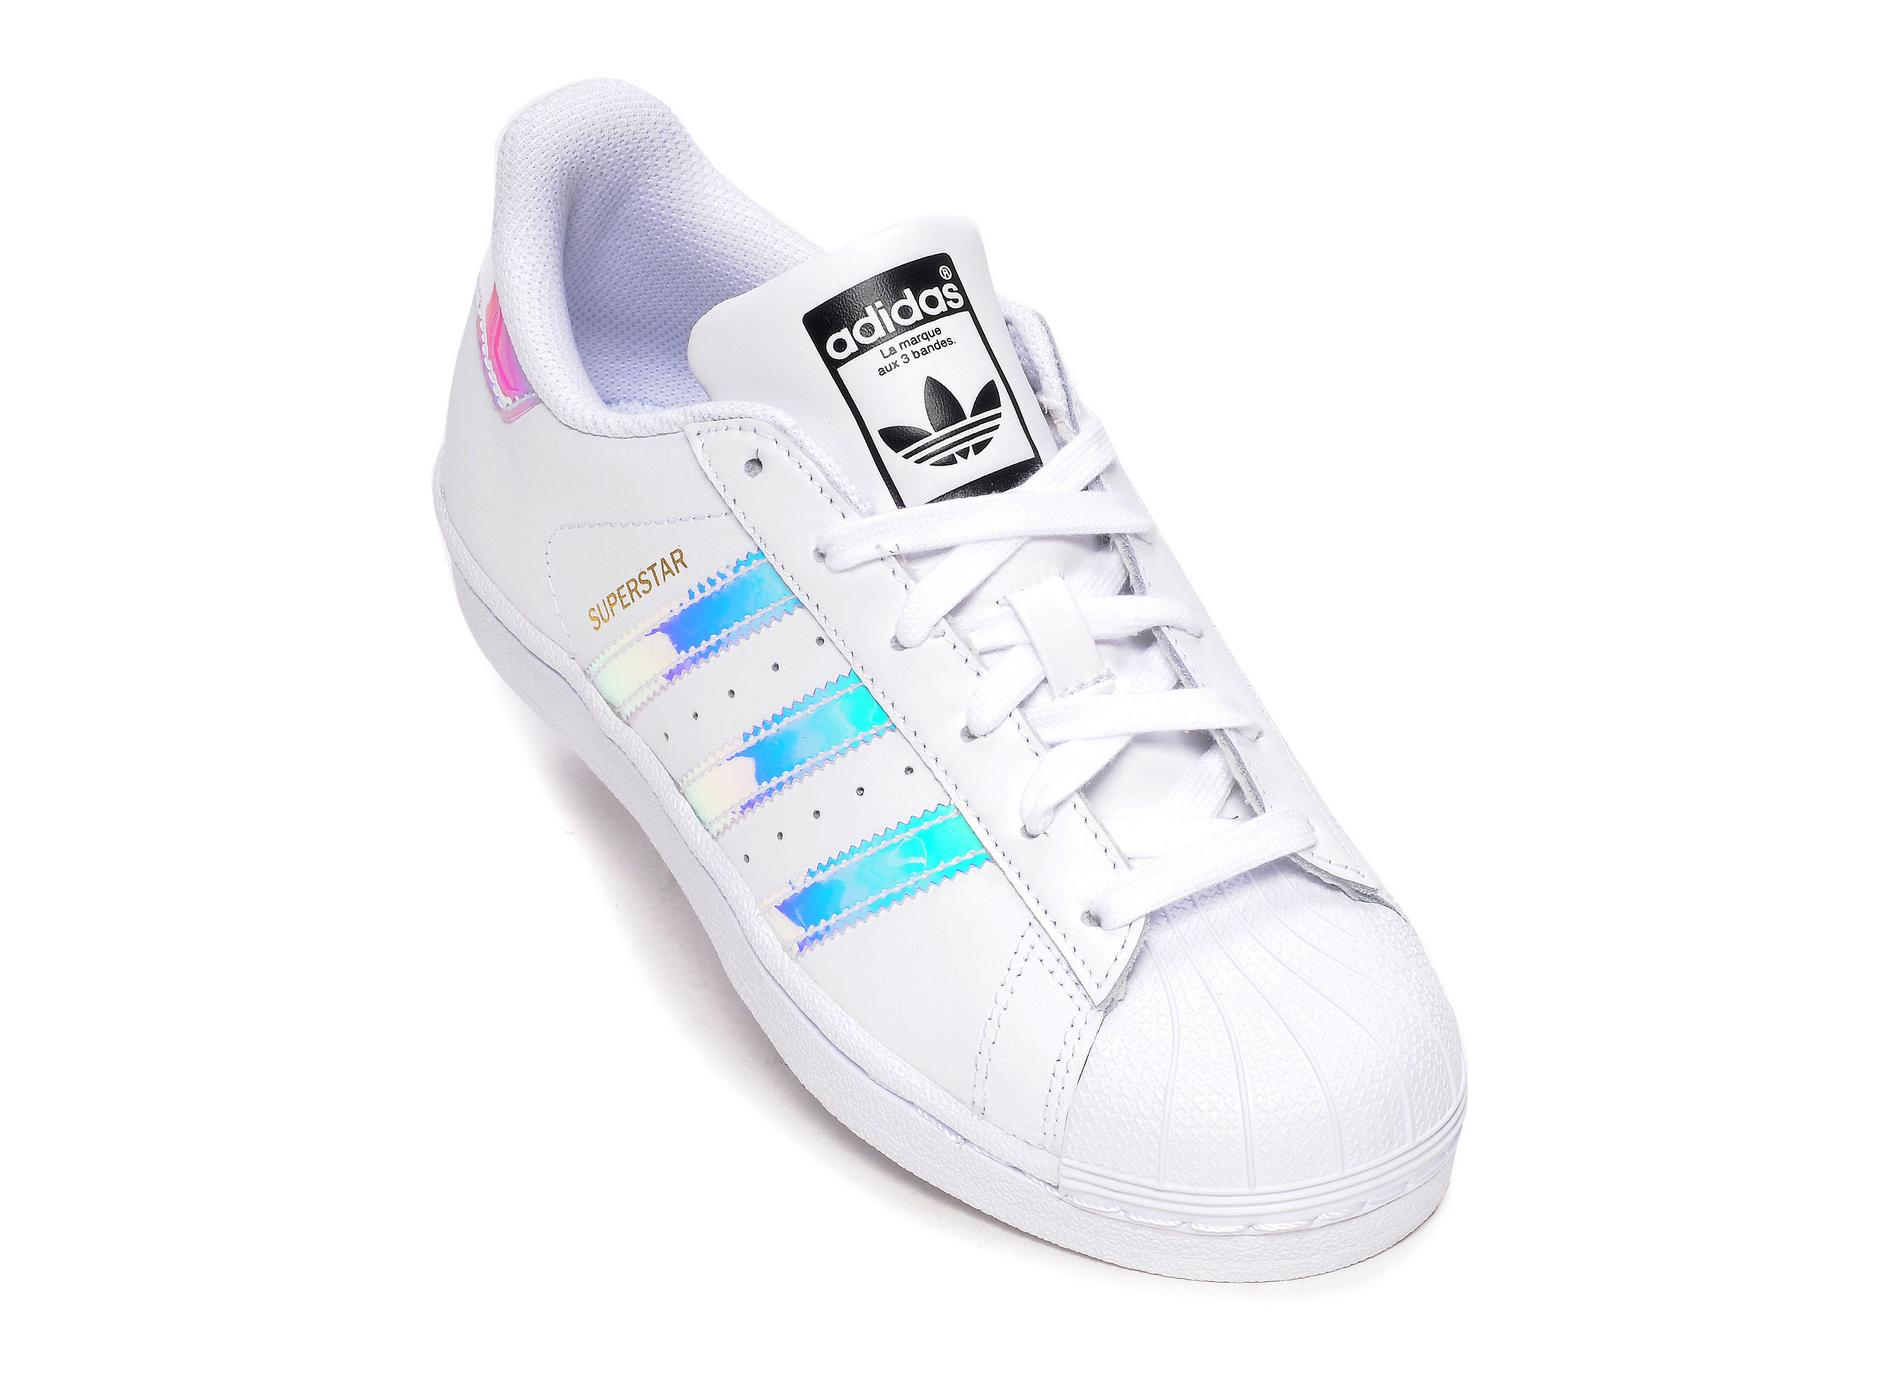 baskets Adidas Superstar ortholite